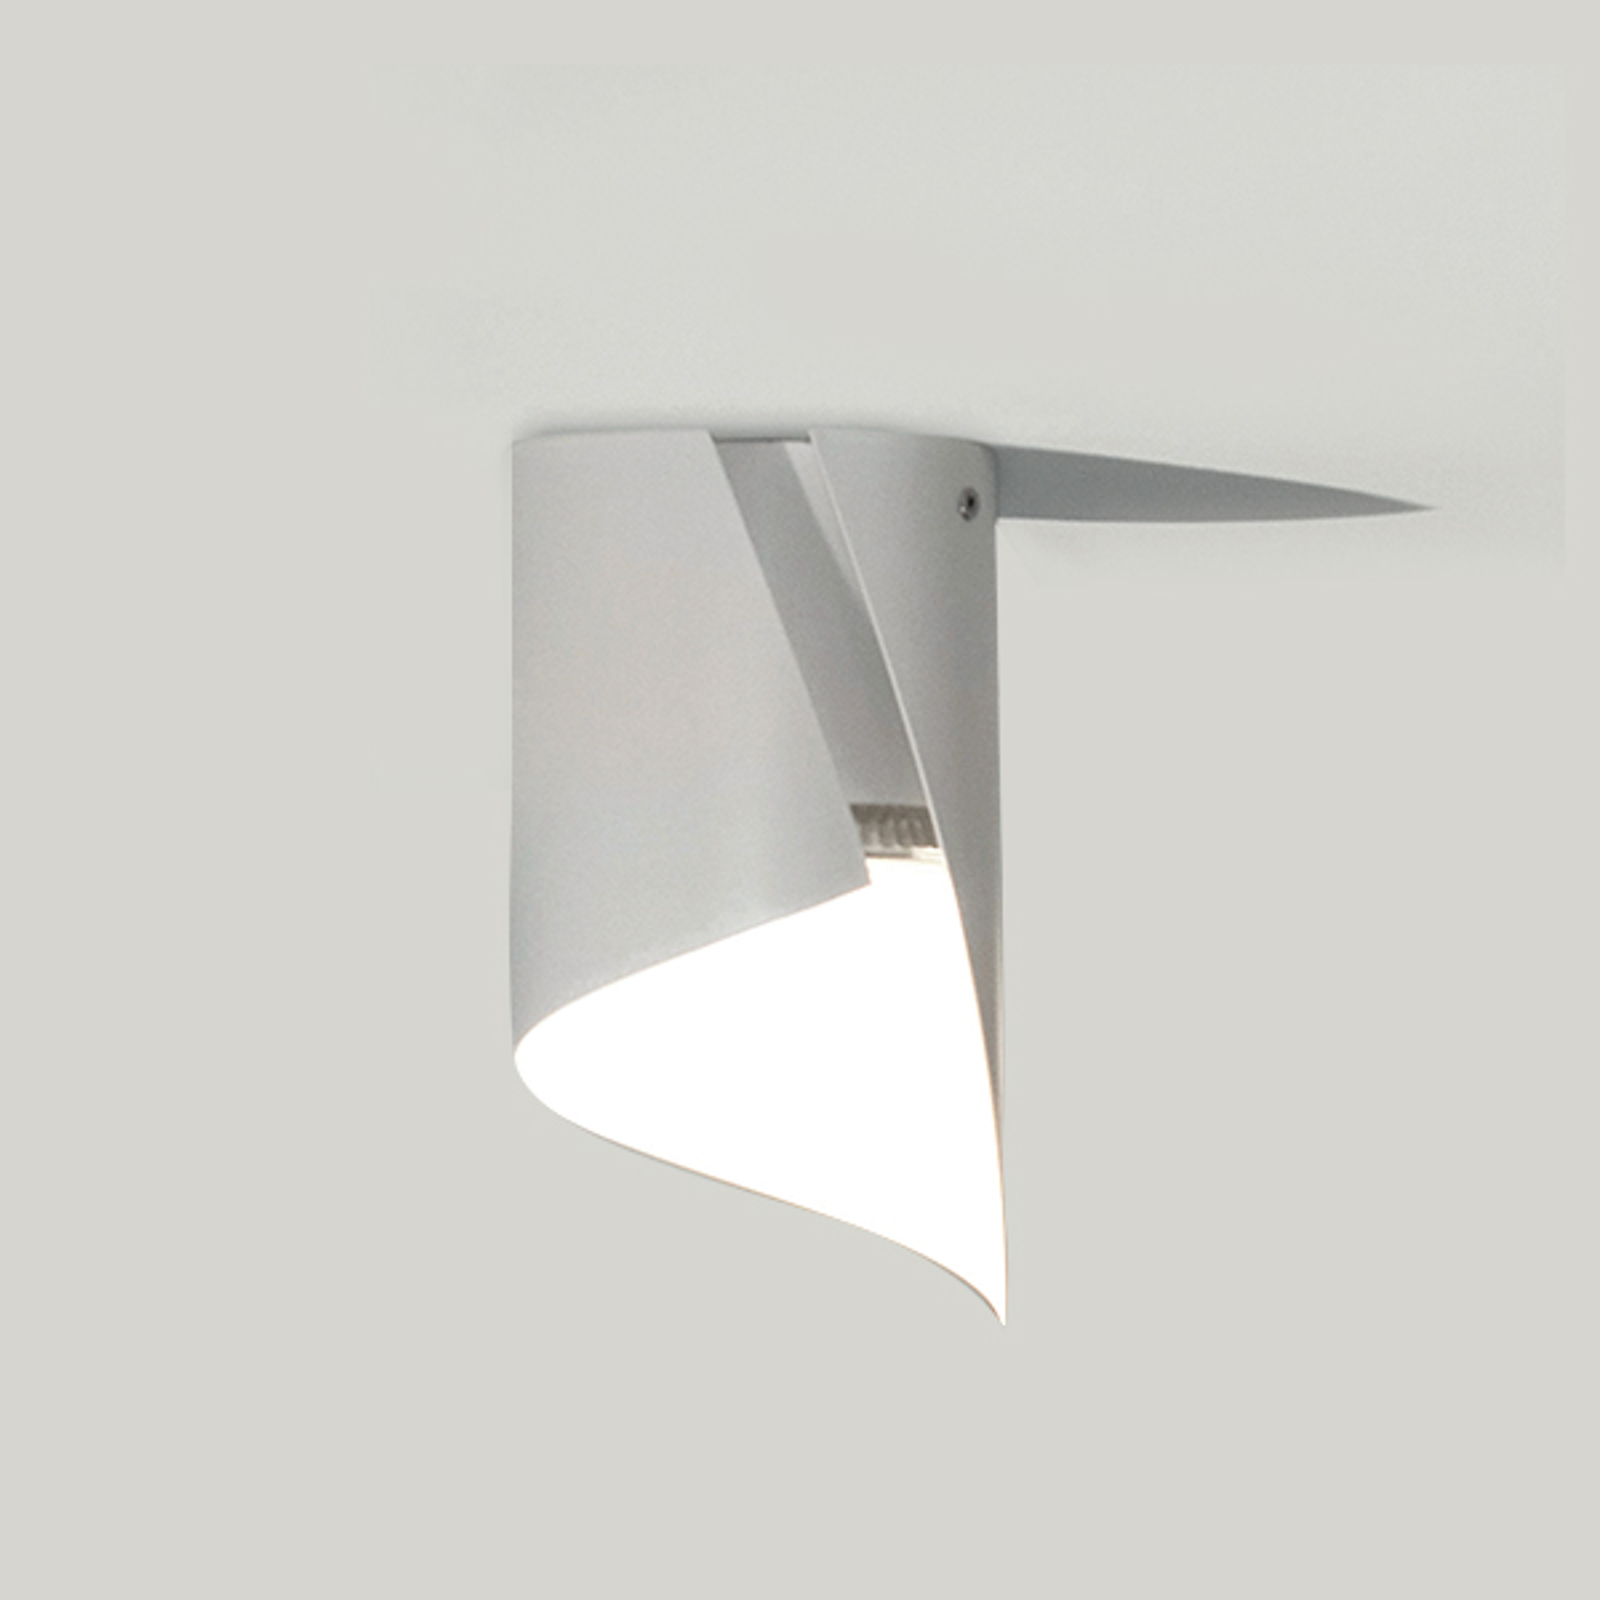 Knikerboker Hué lampa sufitowa LED 12x21cm biała